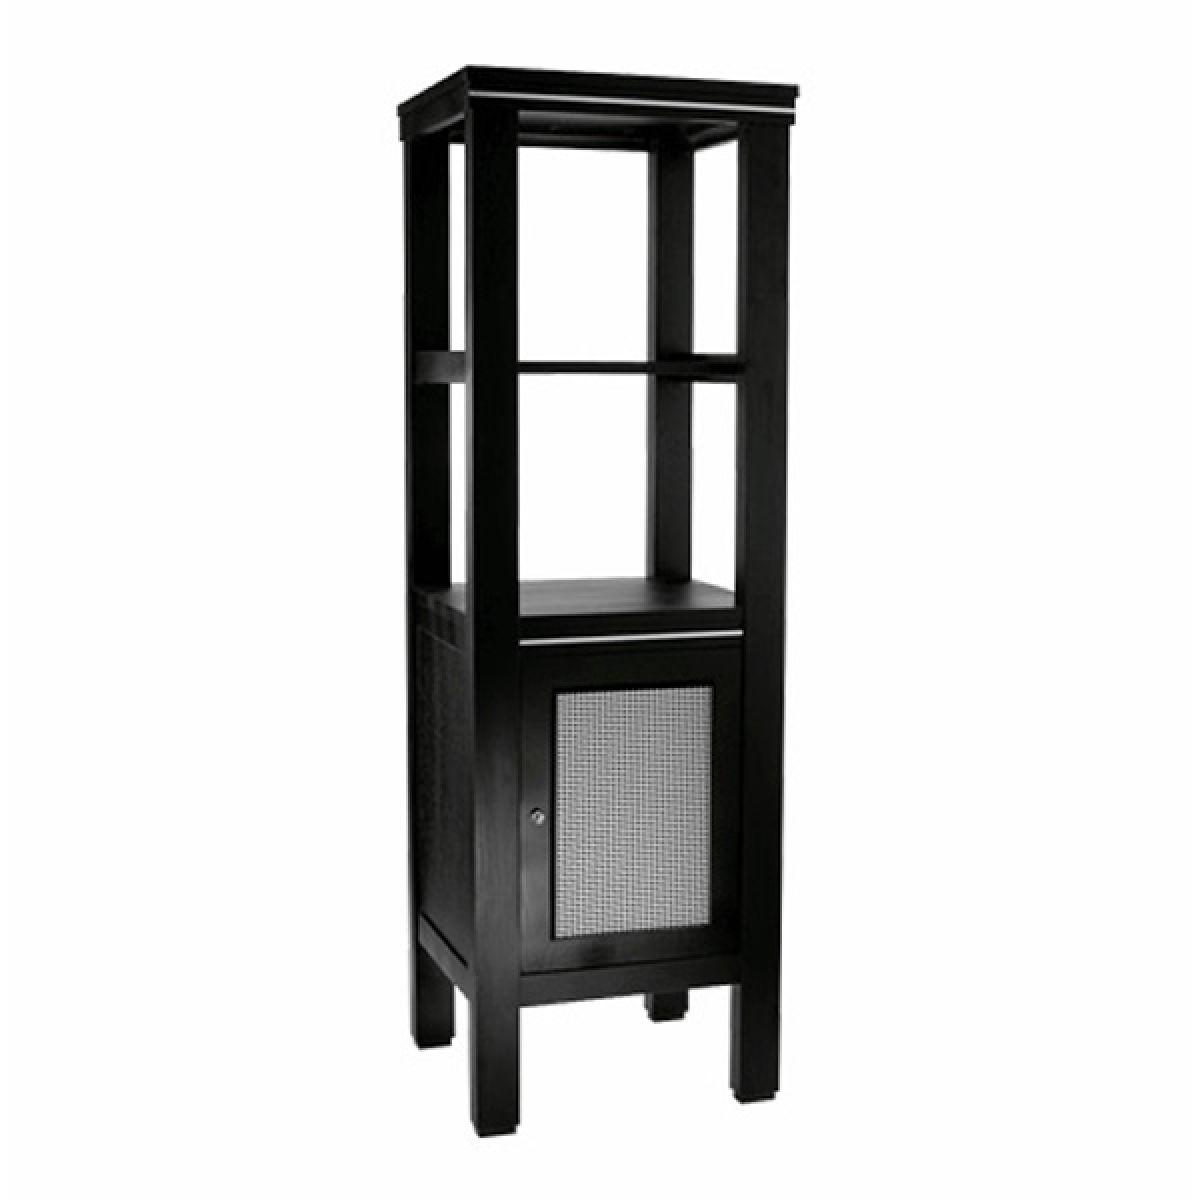 imperial astoria deco cuda metal weave tall storage unit. Black Bedroom Furniture Sets. Home Design Ideas